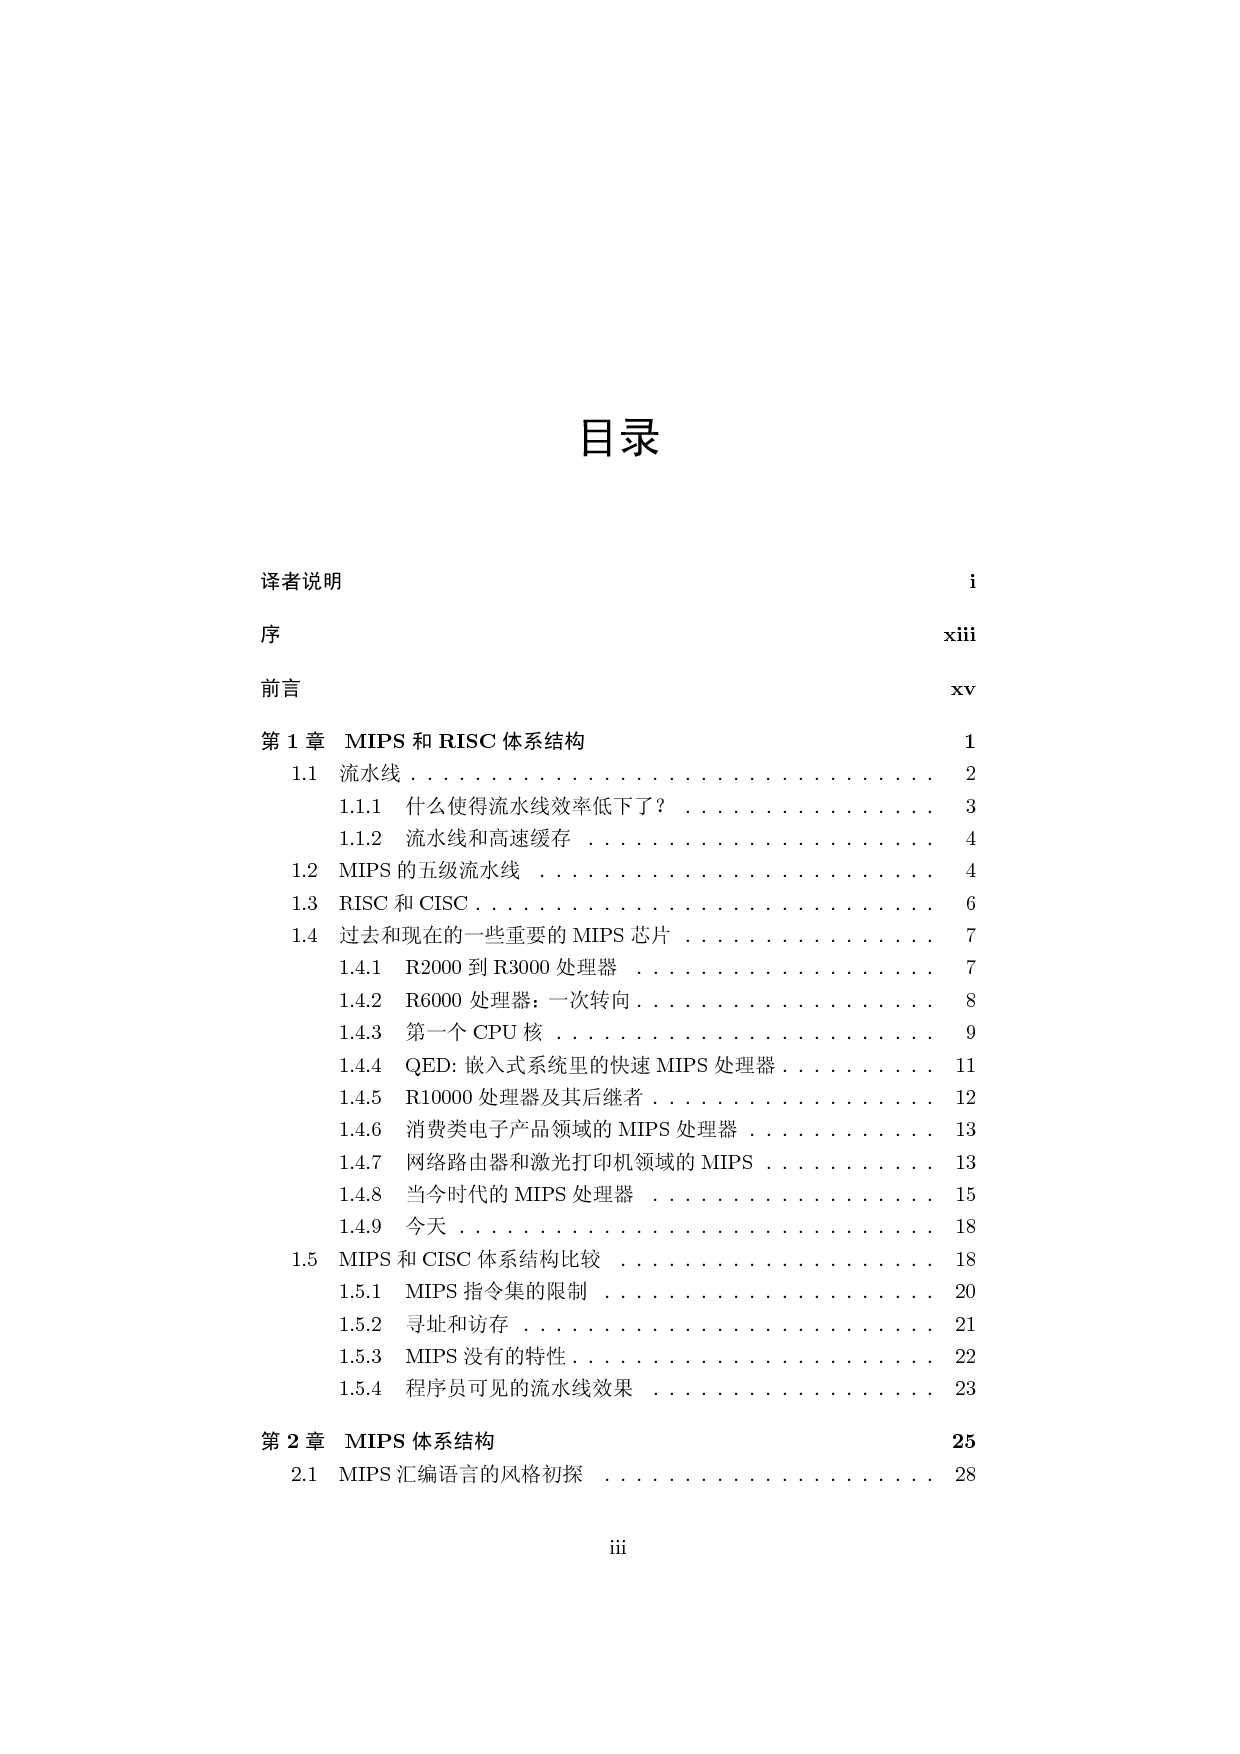 see mips run 中文 版